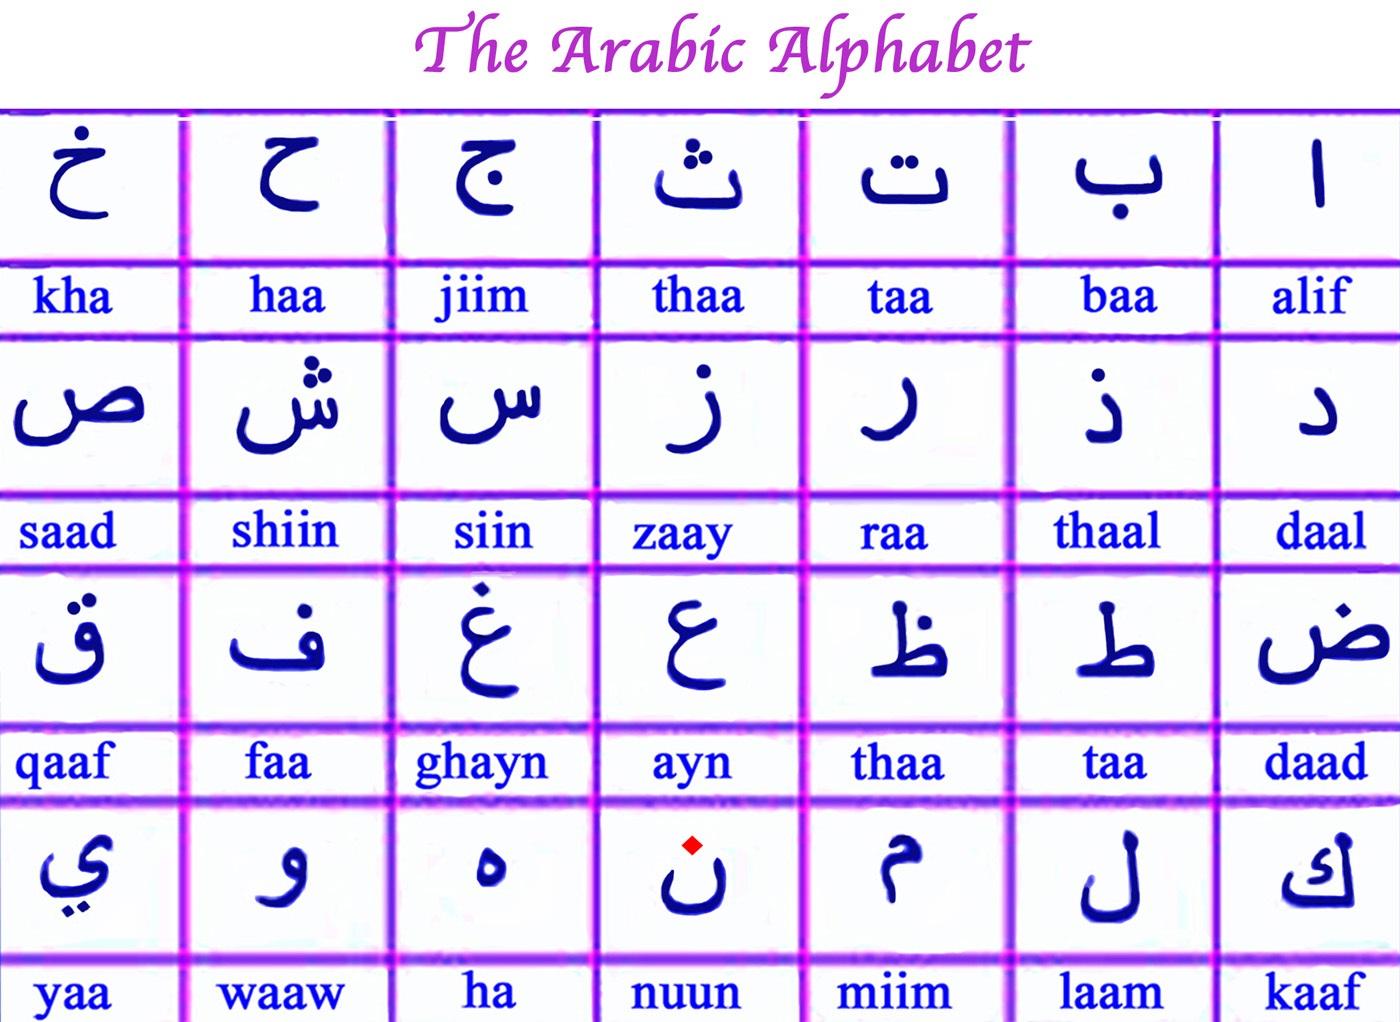 arabic alphabet 2016